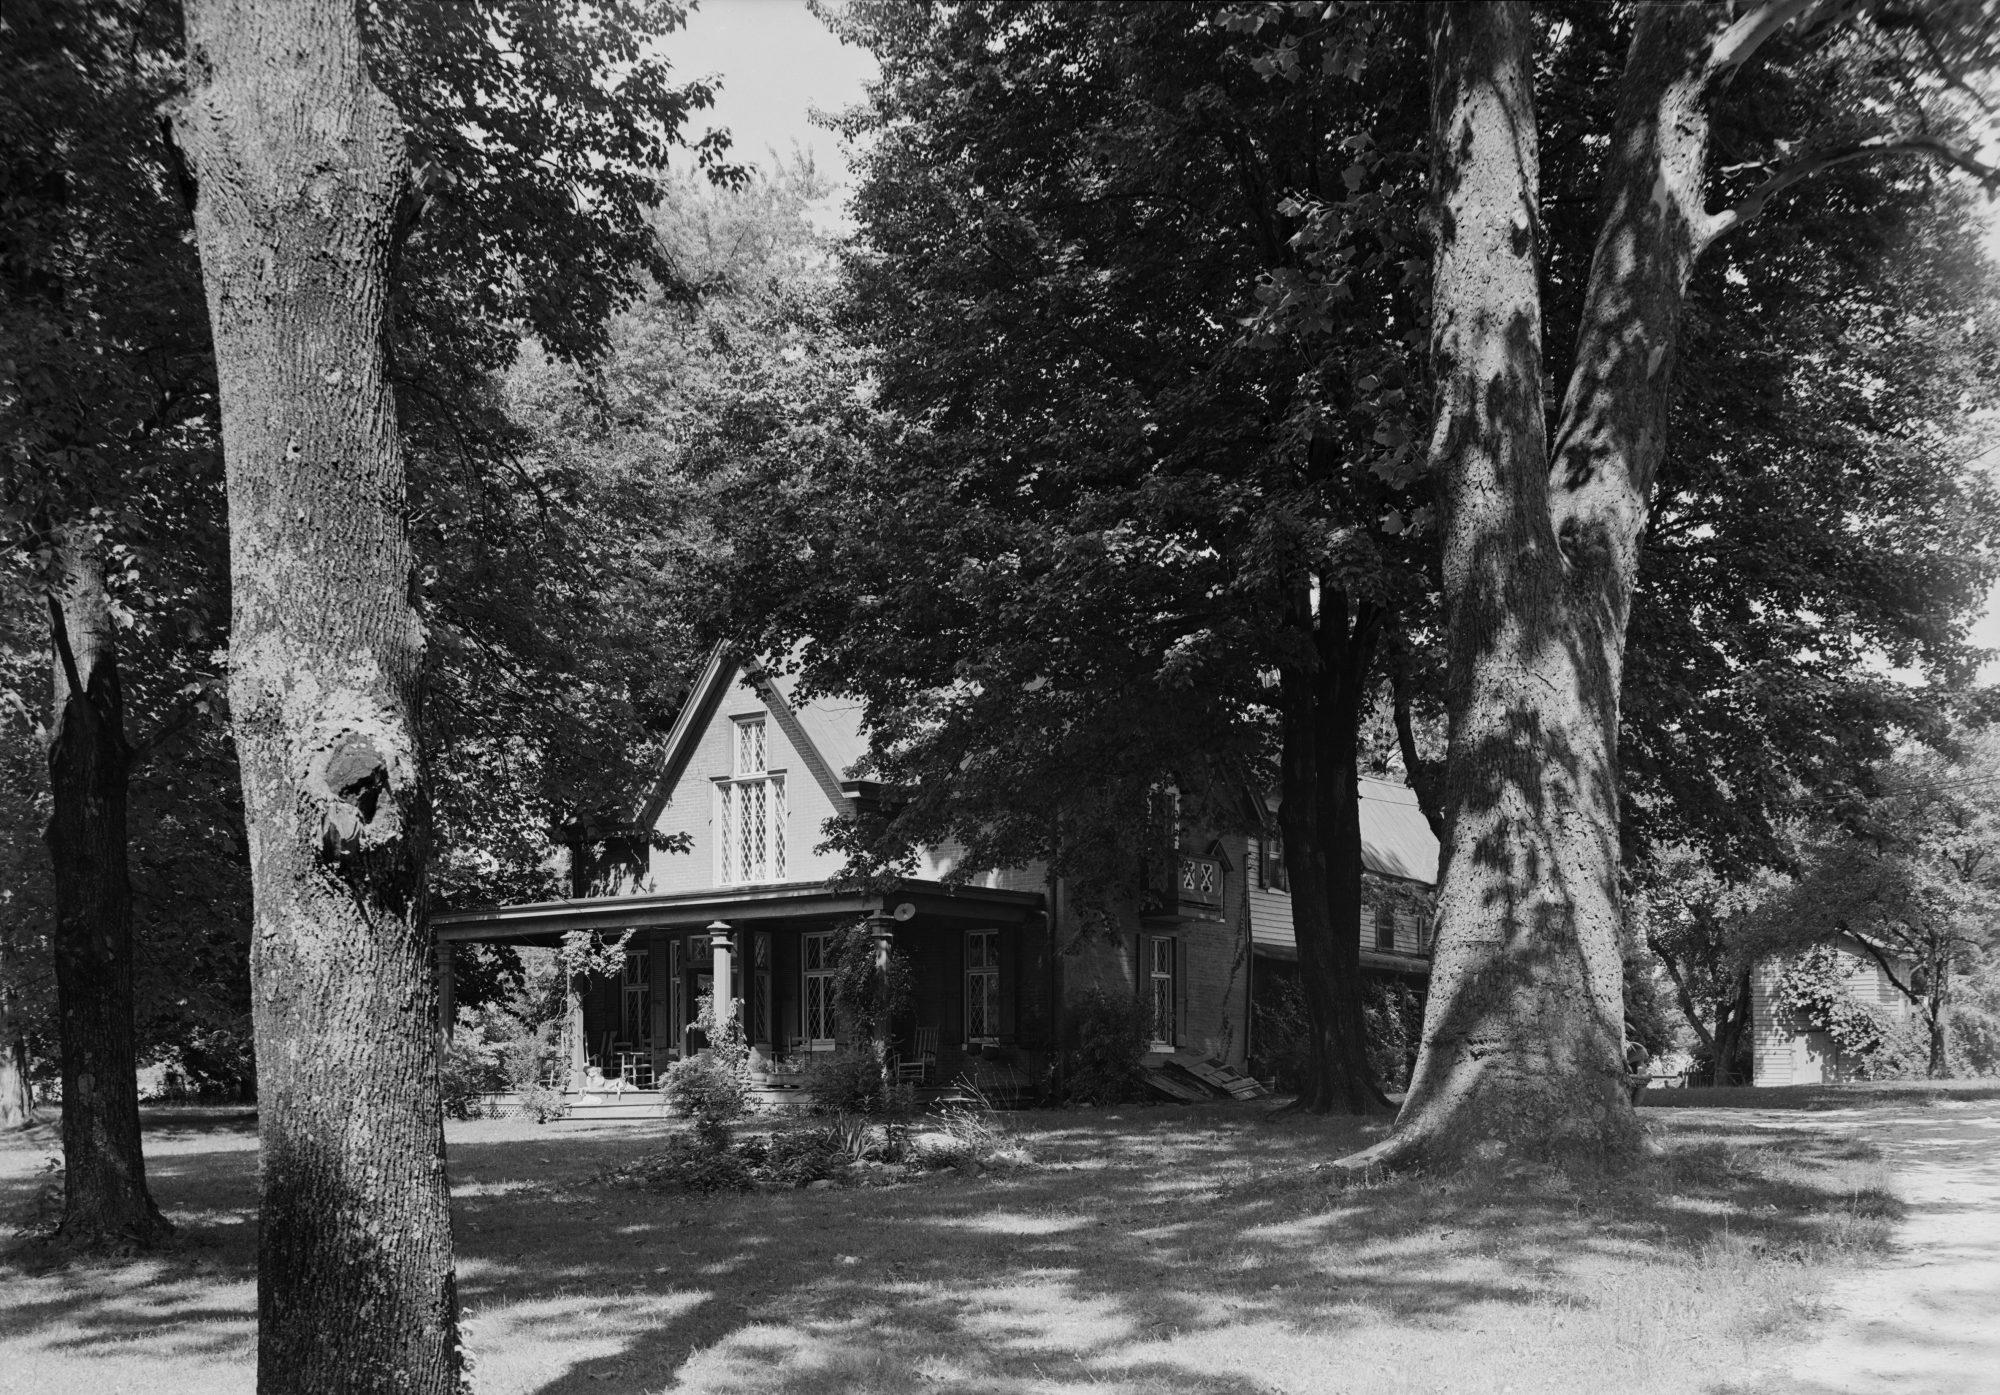 Tudor Hall, Home of the Booth Family – Jennifer Chiaverini